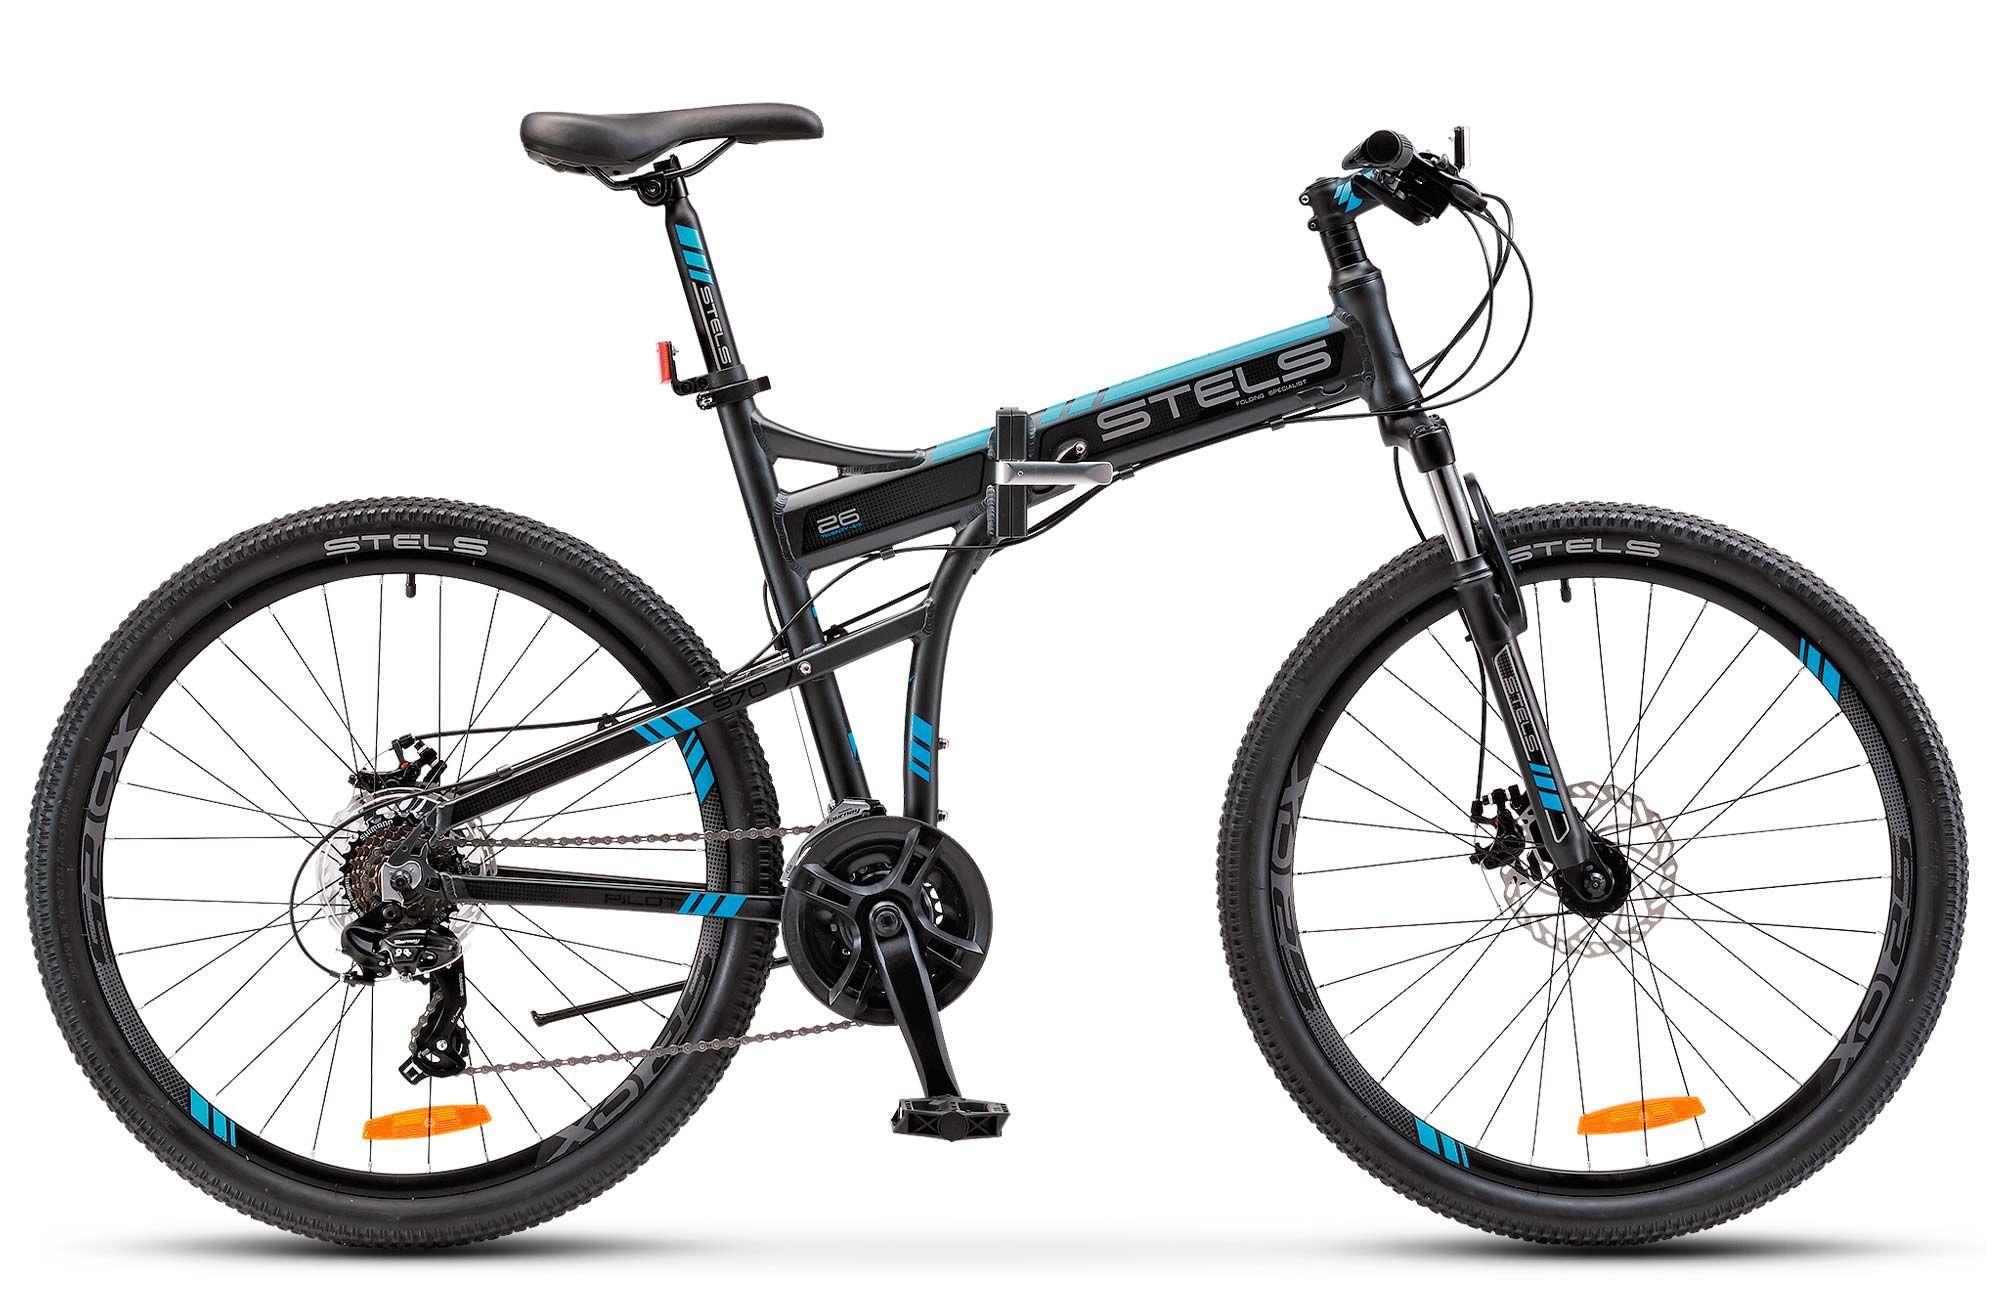 Велосипед Stels Pilot 970 MD 26 (V020) 2018